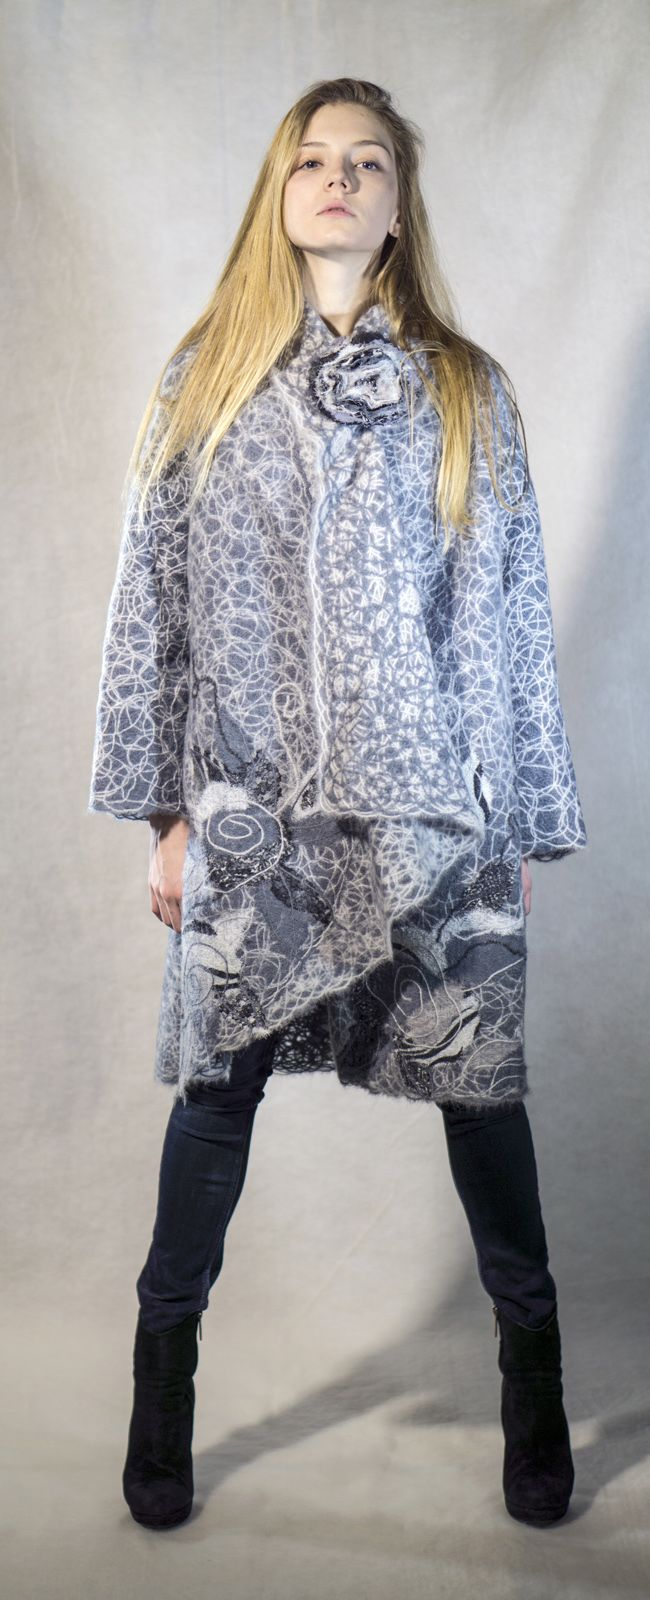 Yaga handmade coat. Material: wool 70%, acrylic 30%. Yaga on Etsy: http://www.etsy.com/shop/Yaga